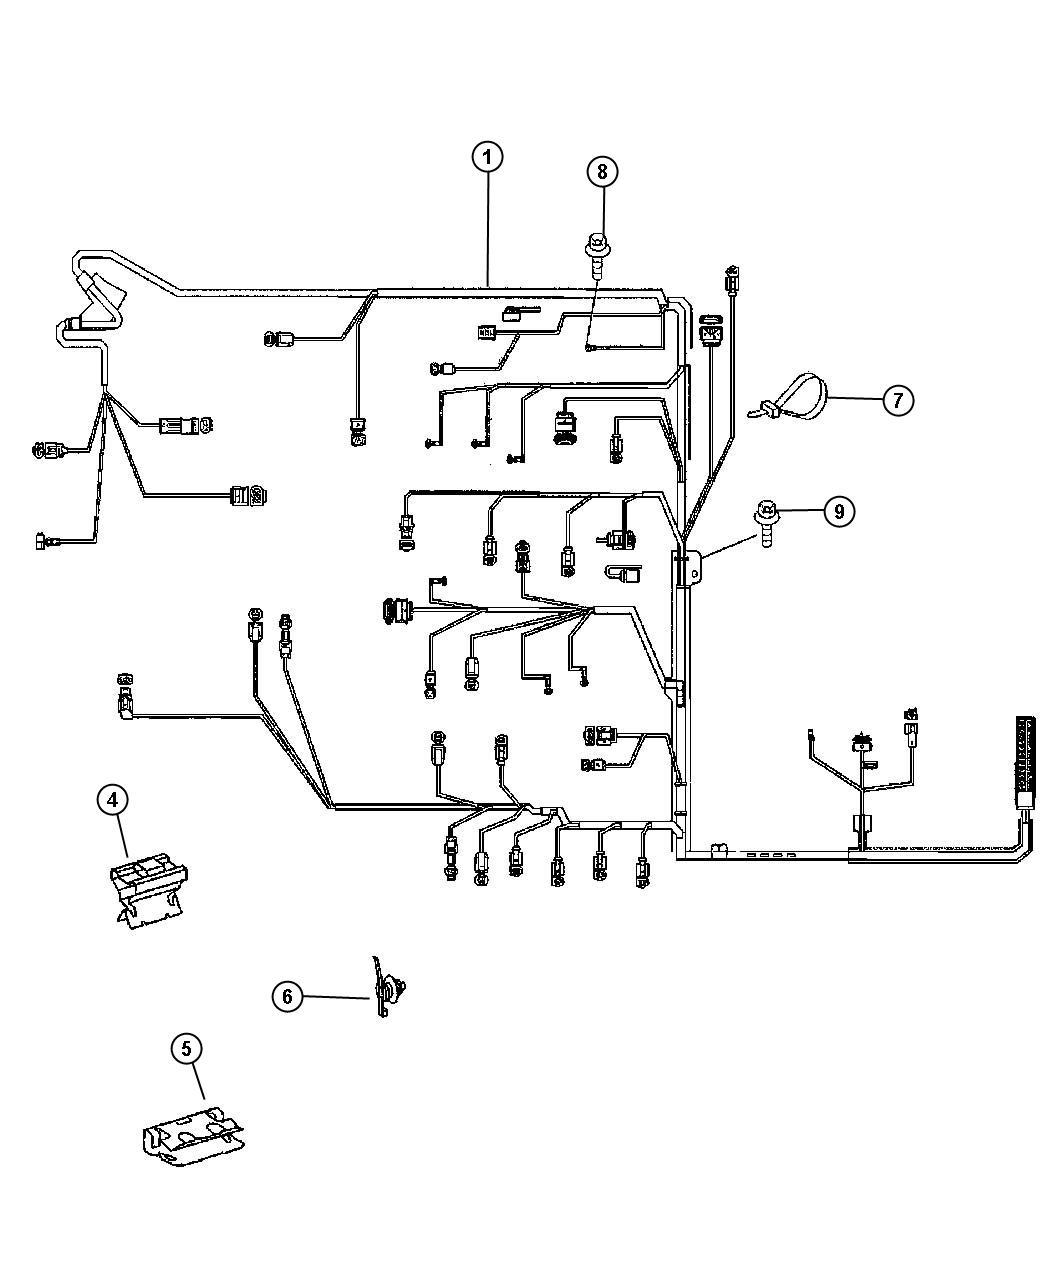 Dodge Sprinter Wiring Battery Alternator Amp